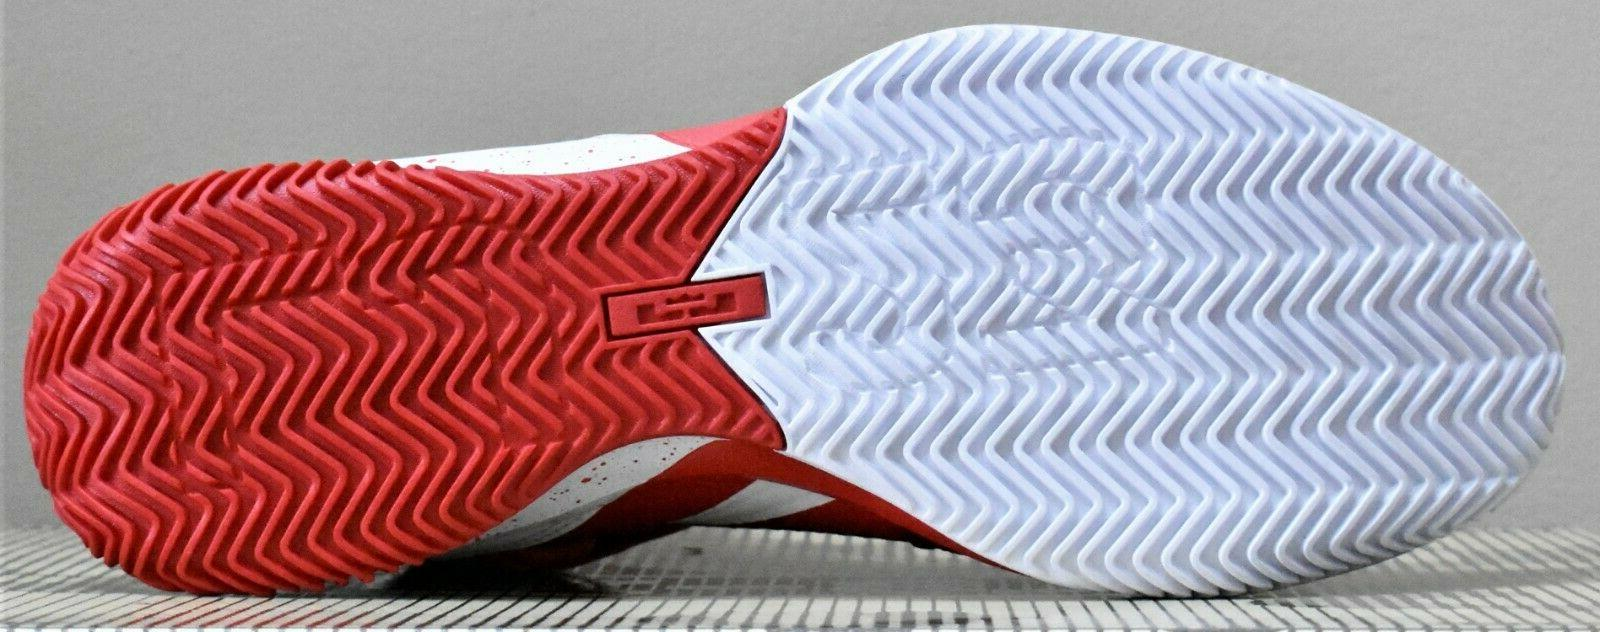 Nike Lebron Soldier XIII 13 SFG TB New Men's University